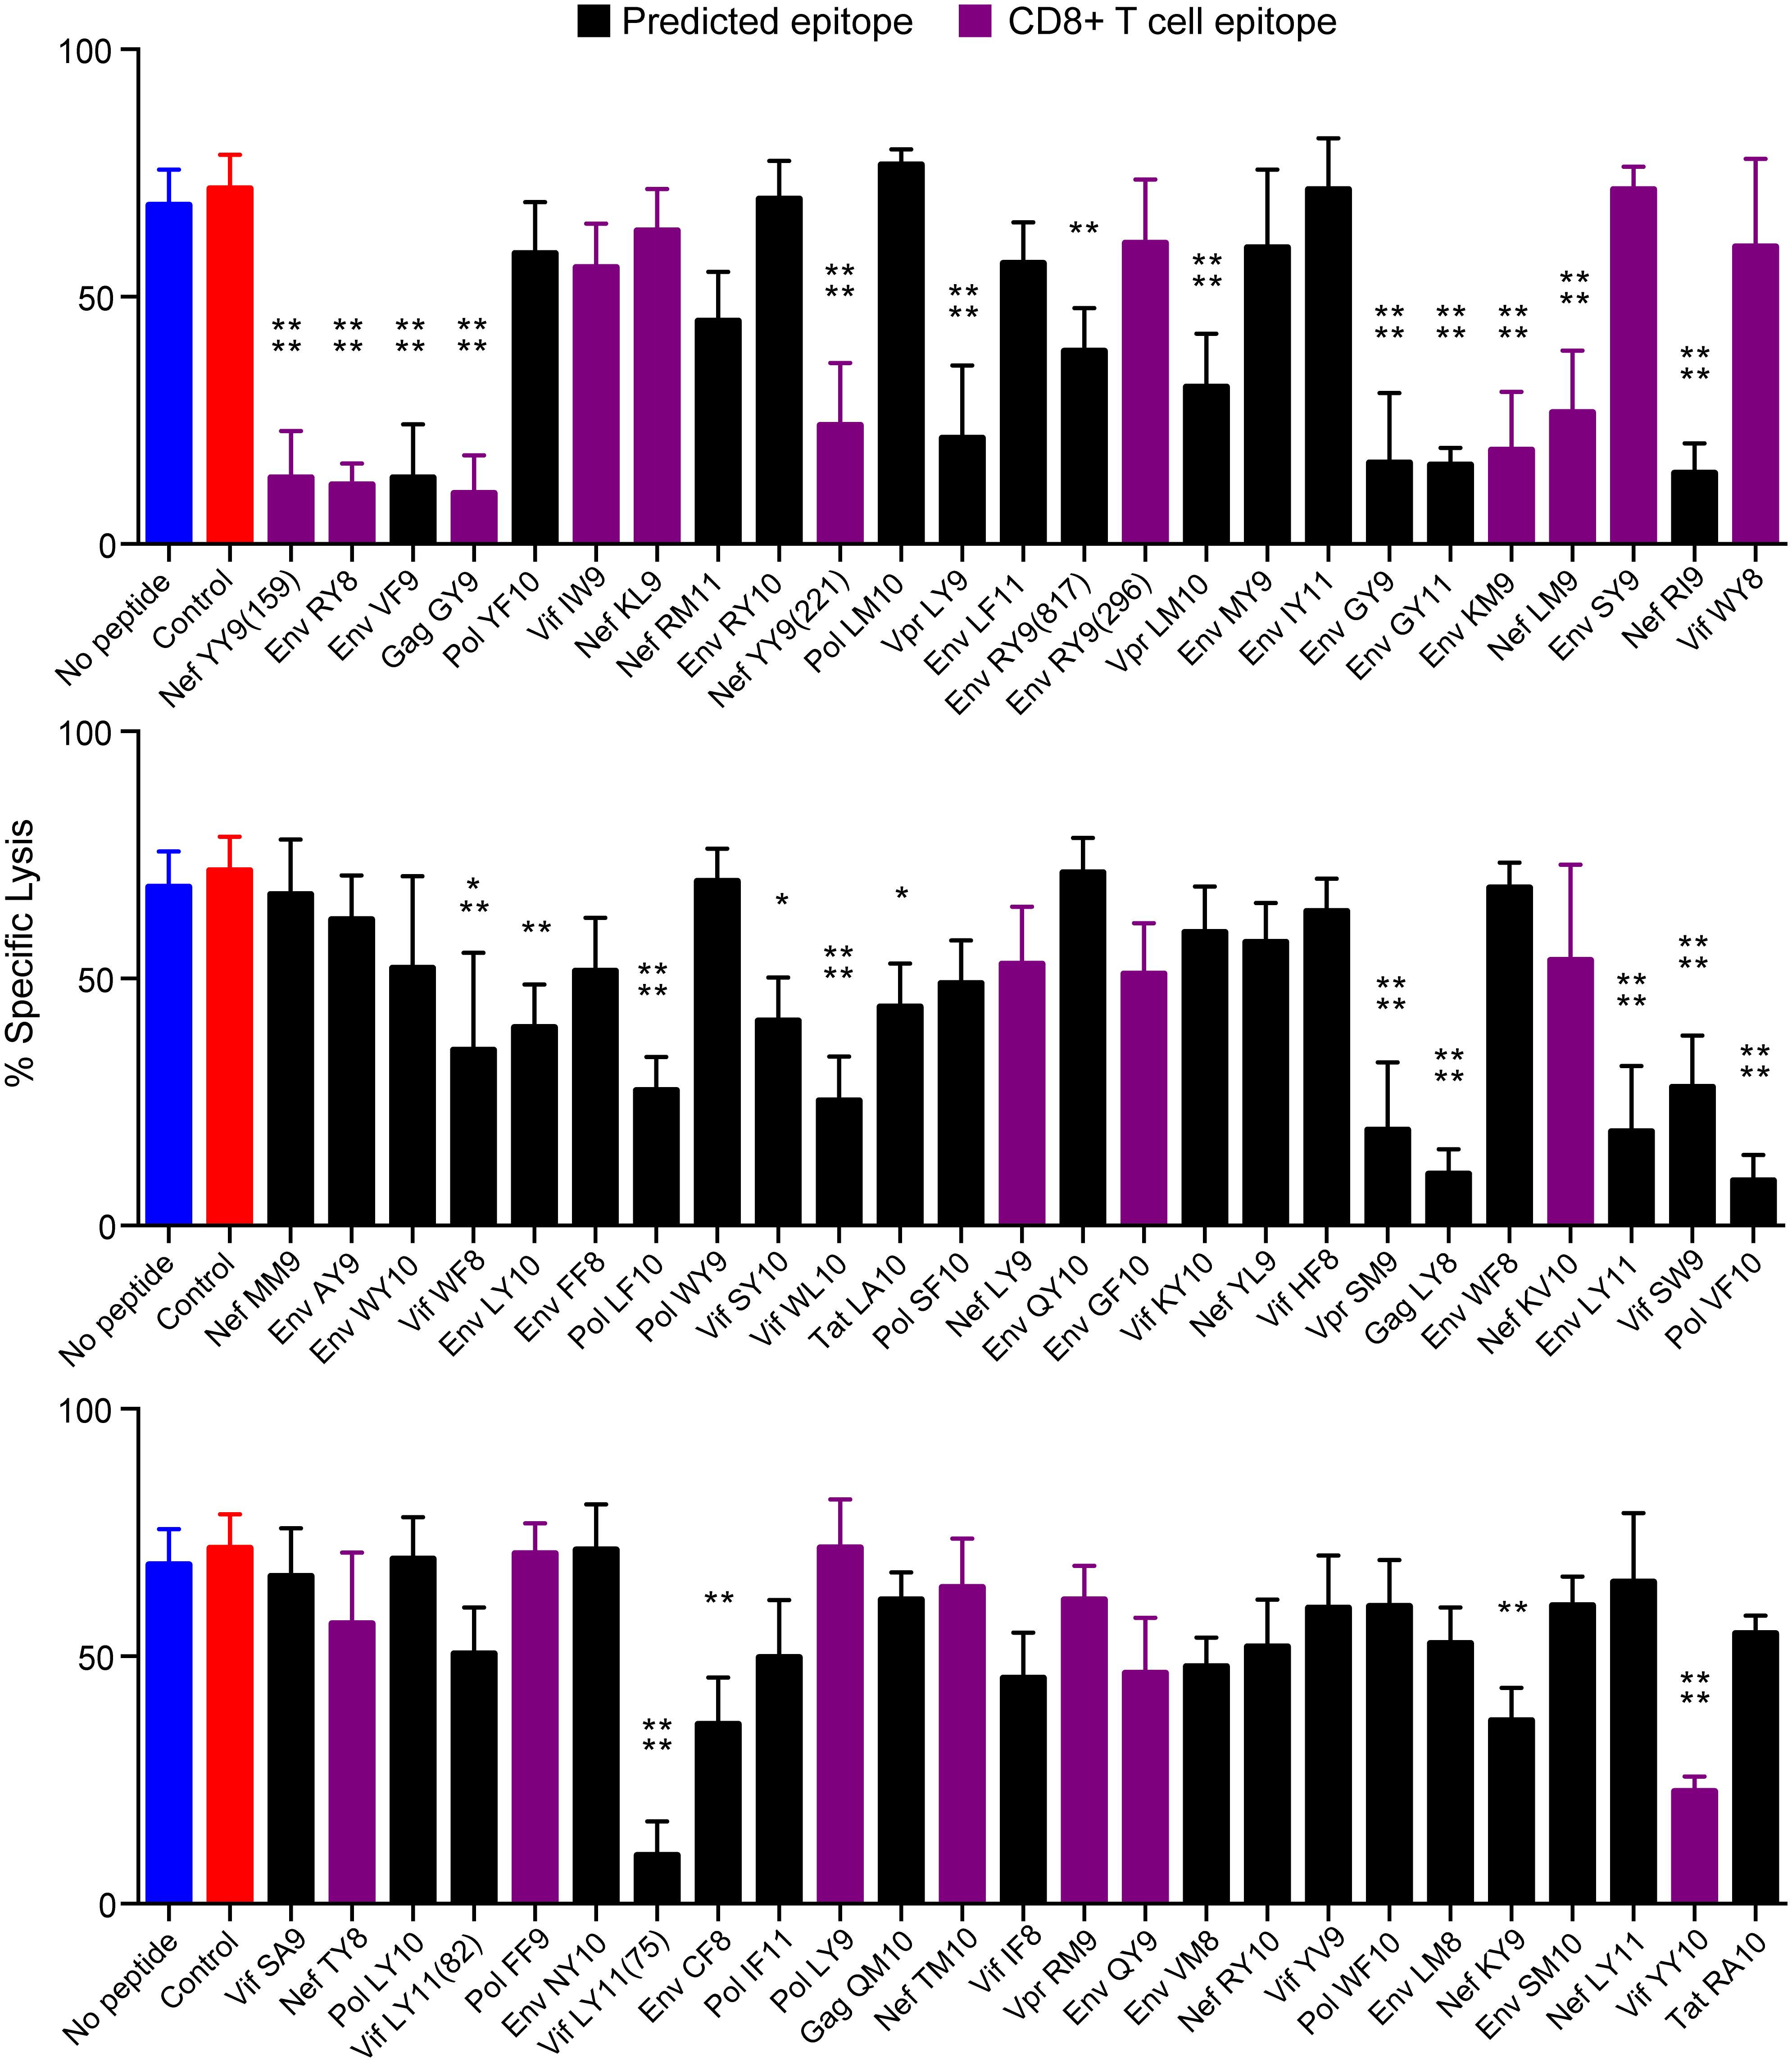 Twenty-eight of 75 SIV peptides bound by Mamu-A1*002 inhibit Mamu-KIR3DL05<sup>+</sup> NK cells.